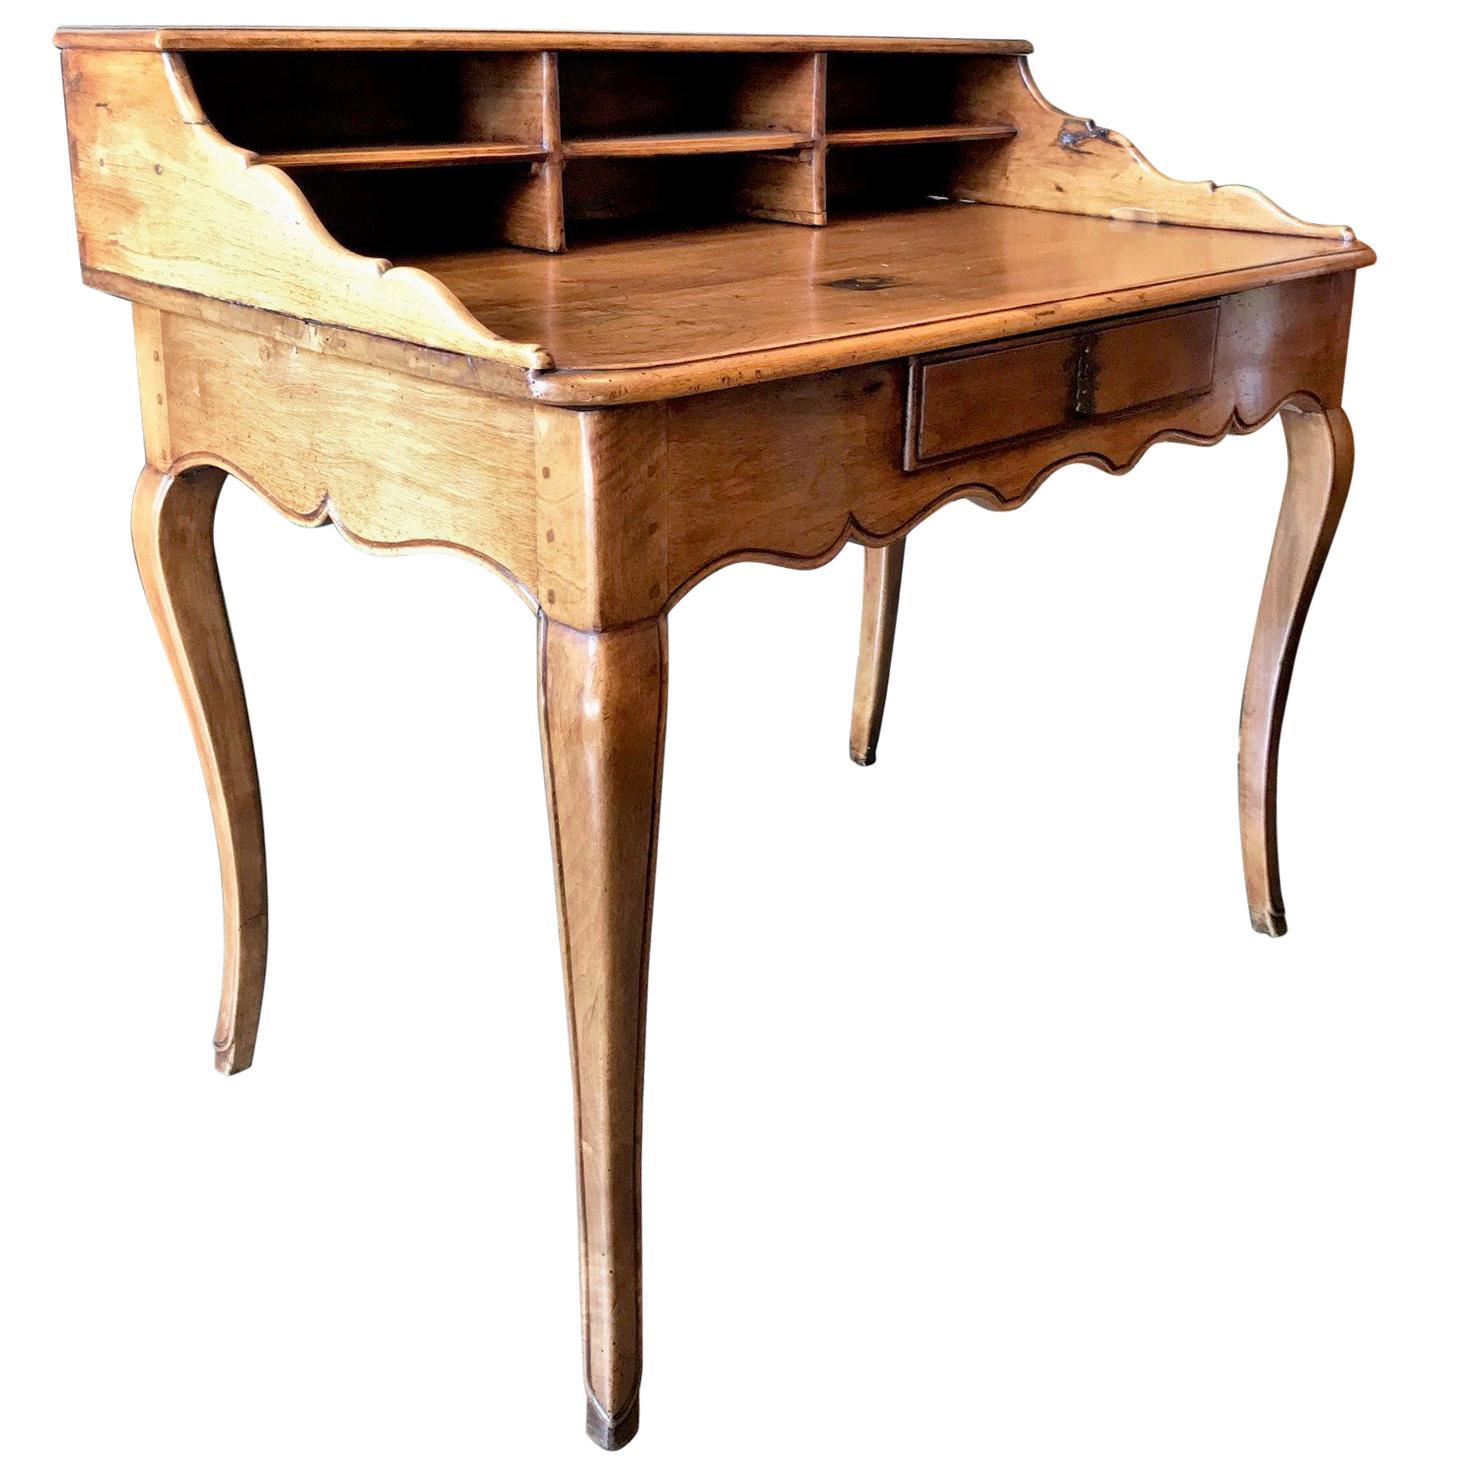 Bureau Table Provencal 18th C. antique Cartonnier Writing office Desk in Walnut